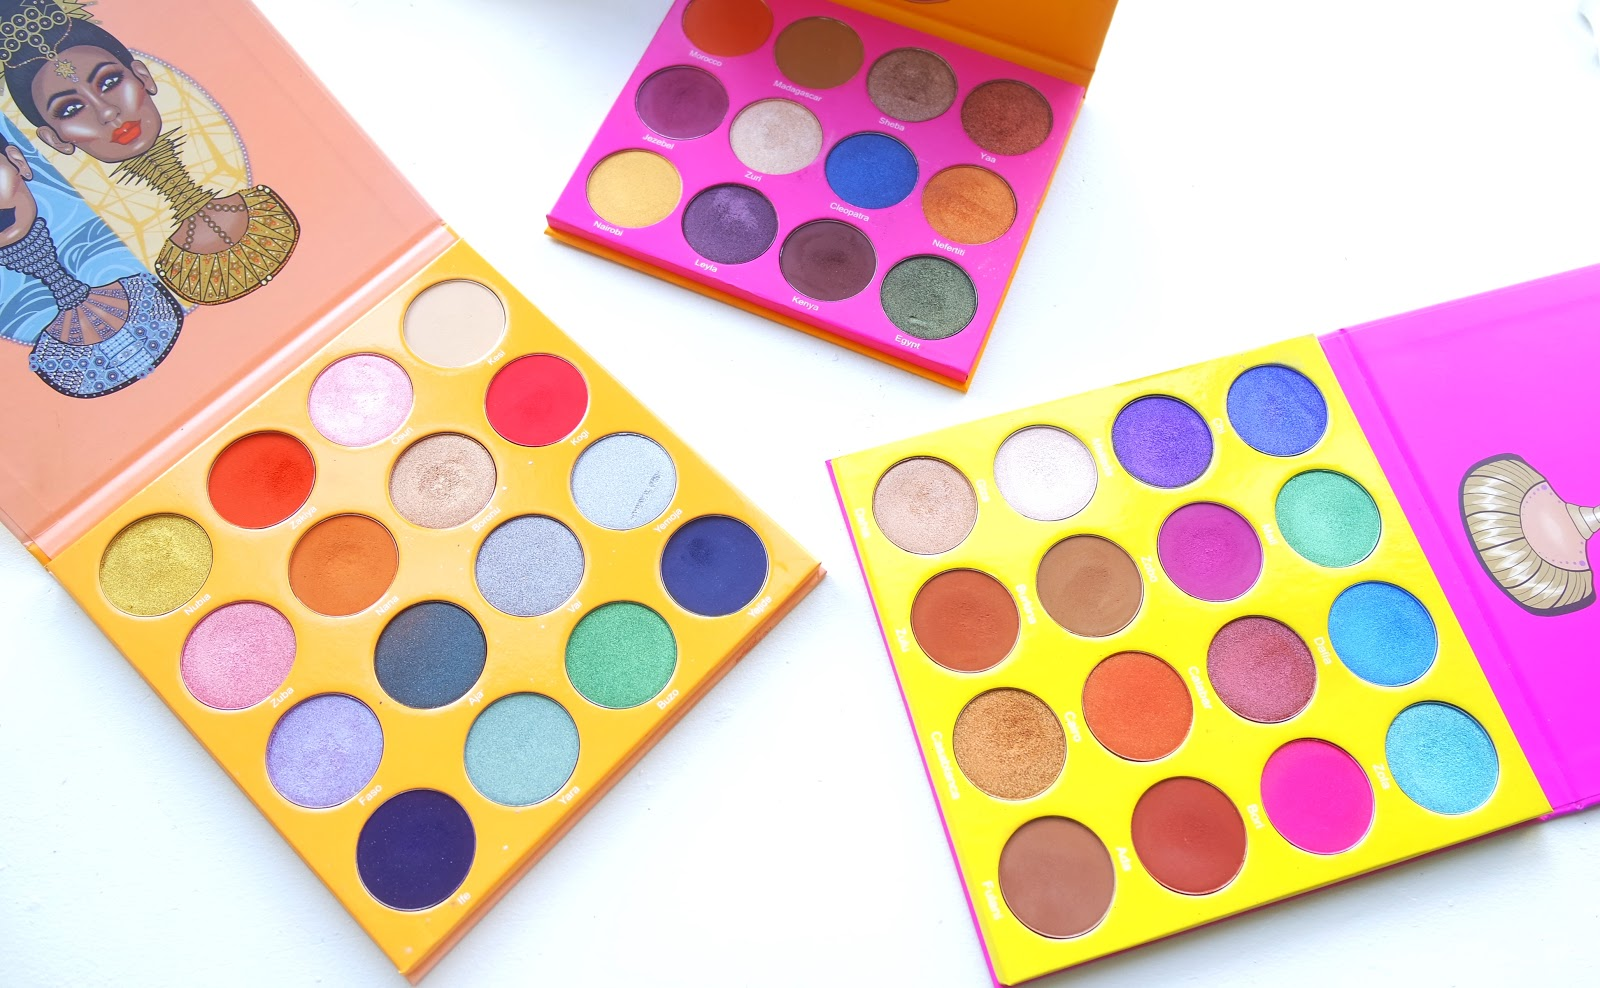 Juvia's Place Cosmetics Eyeshadow palettes